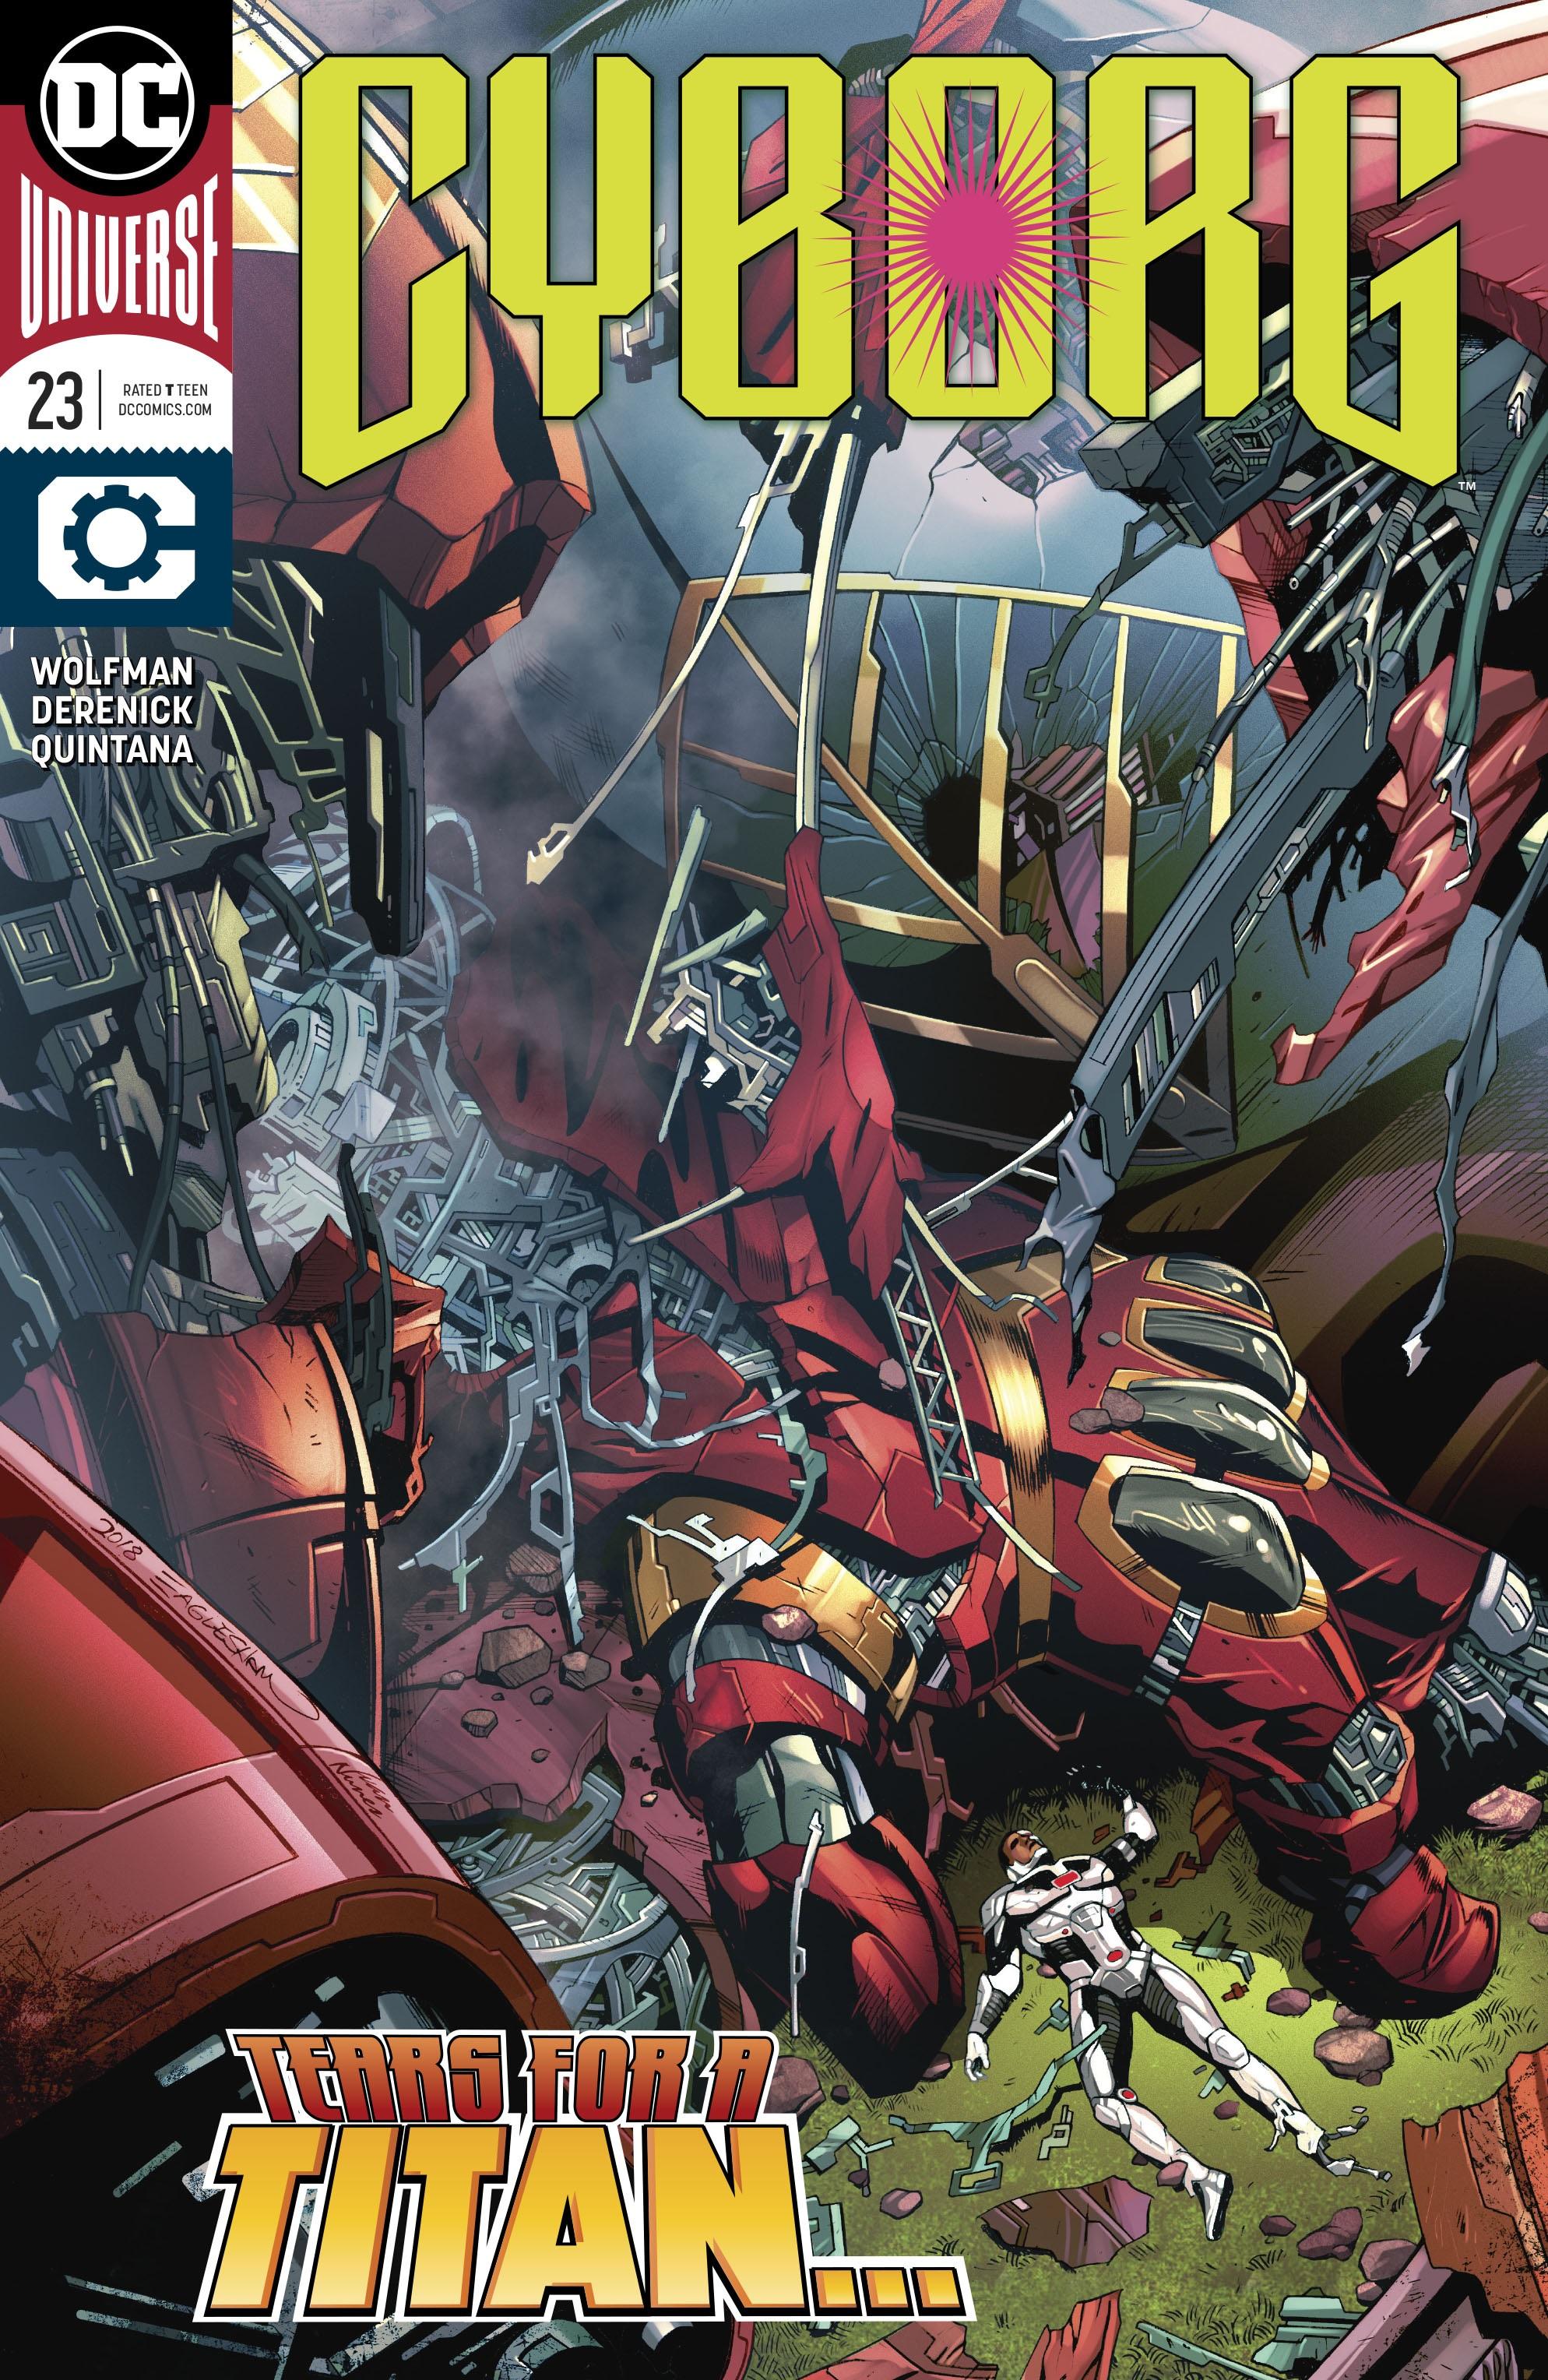 Cyborg Vol 2 23